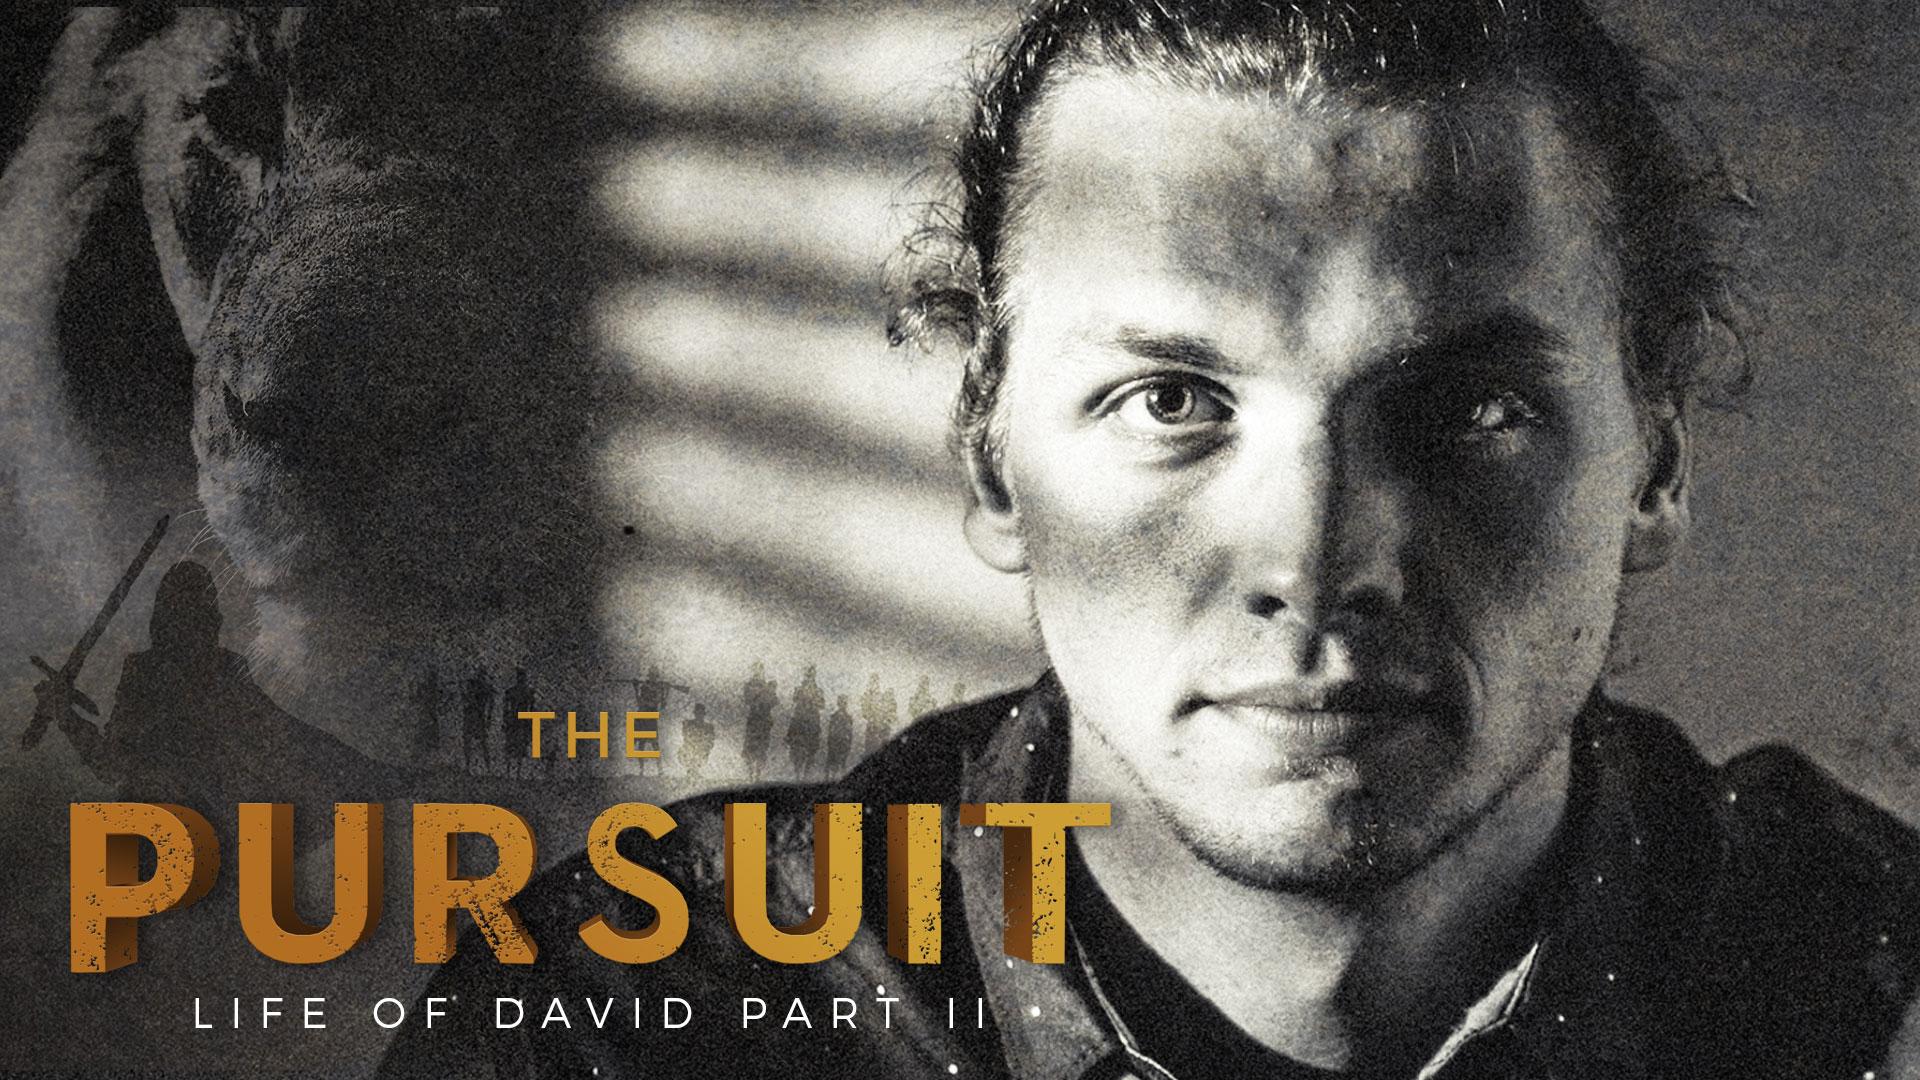 The Pursuit II - life of david